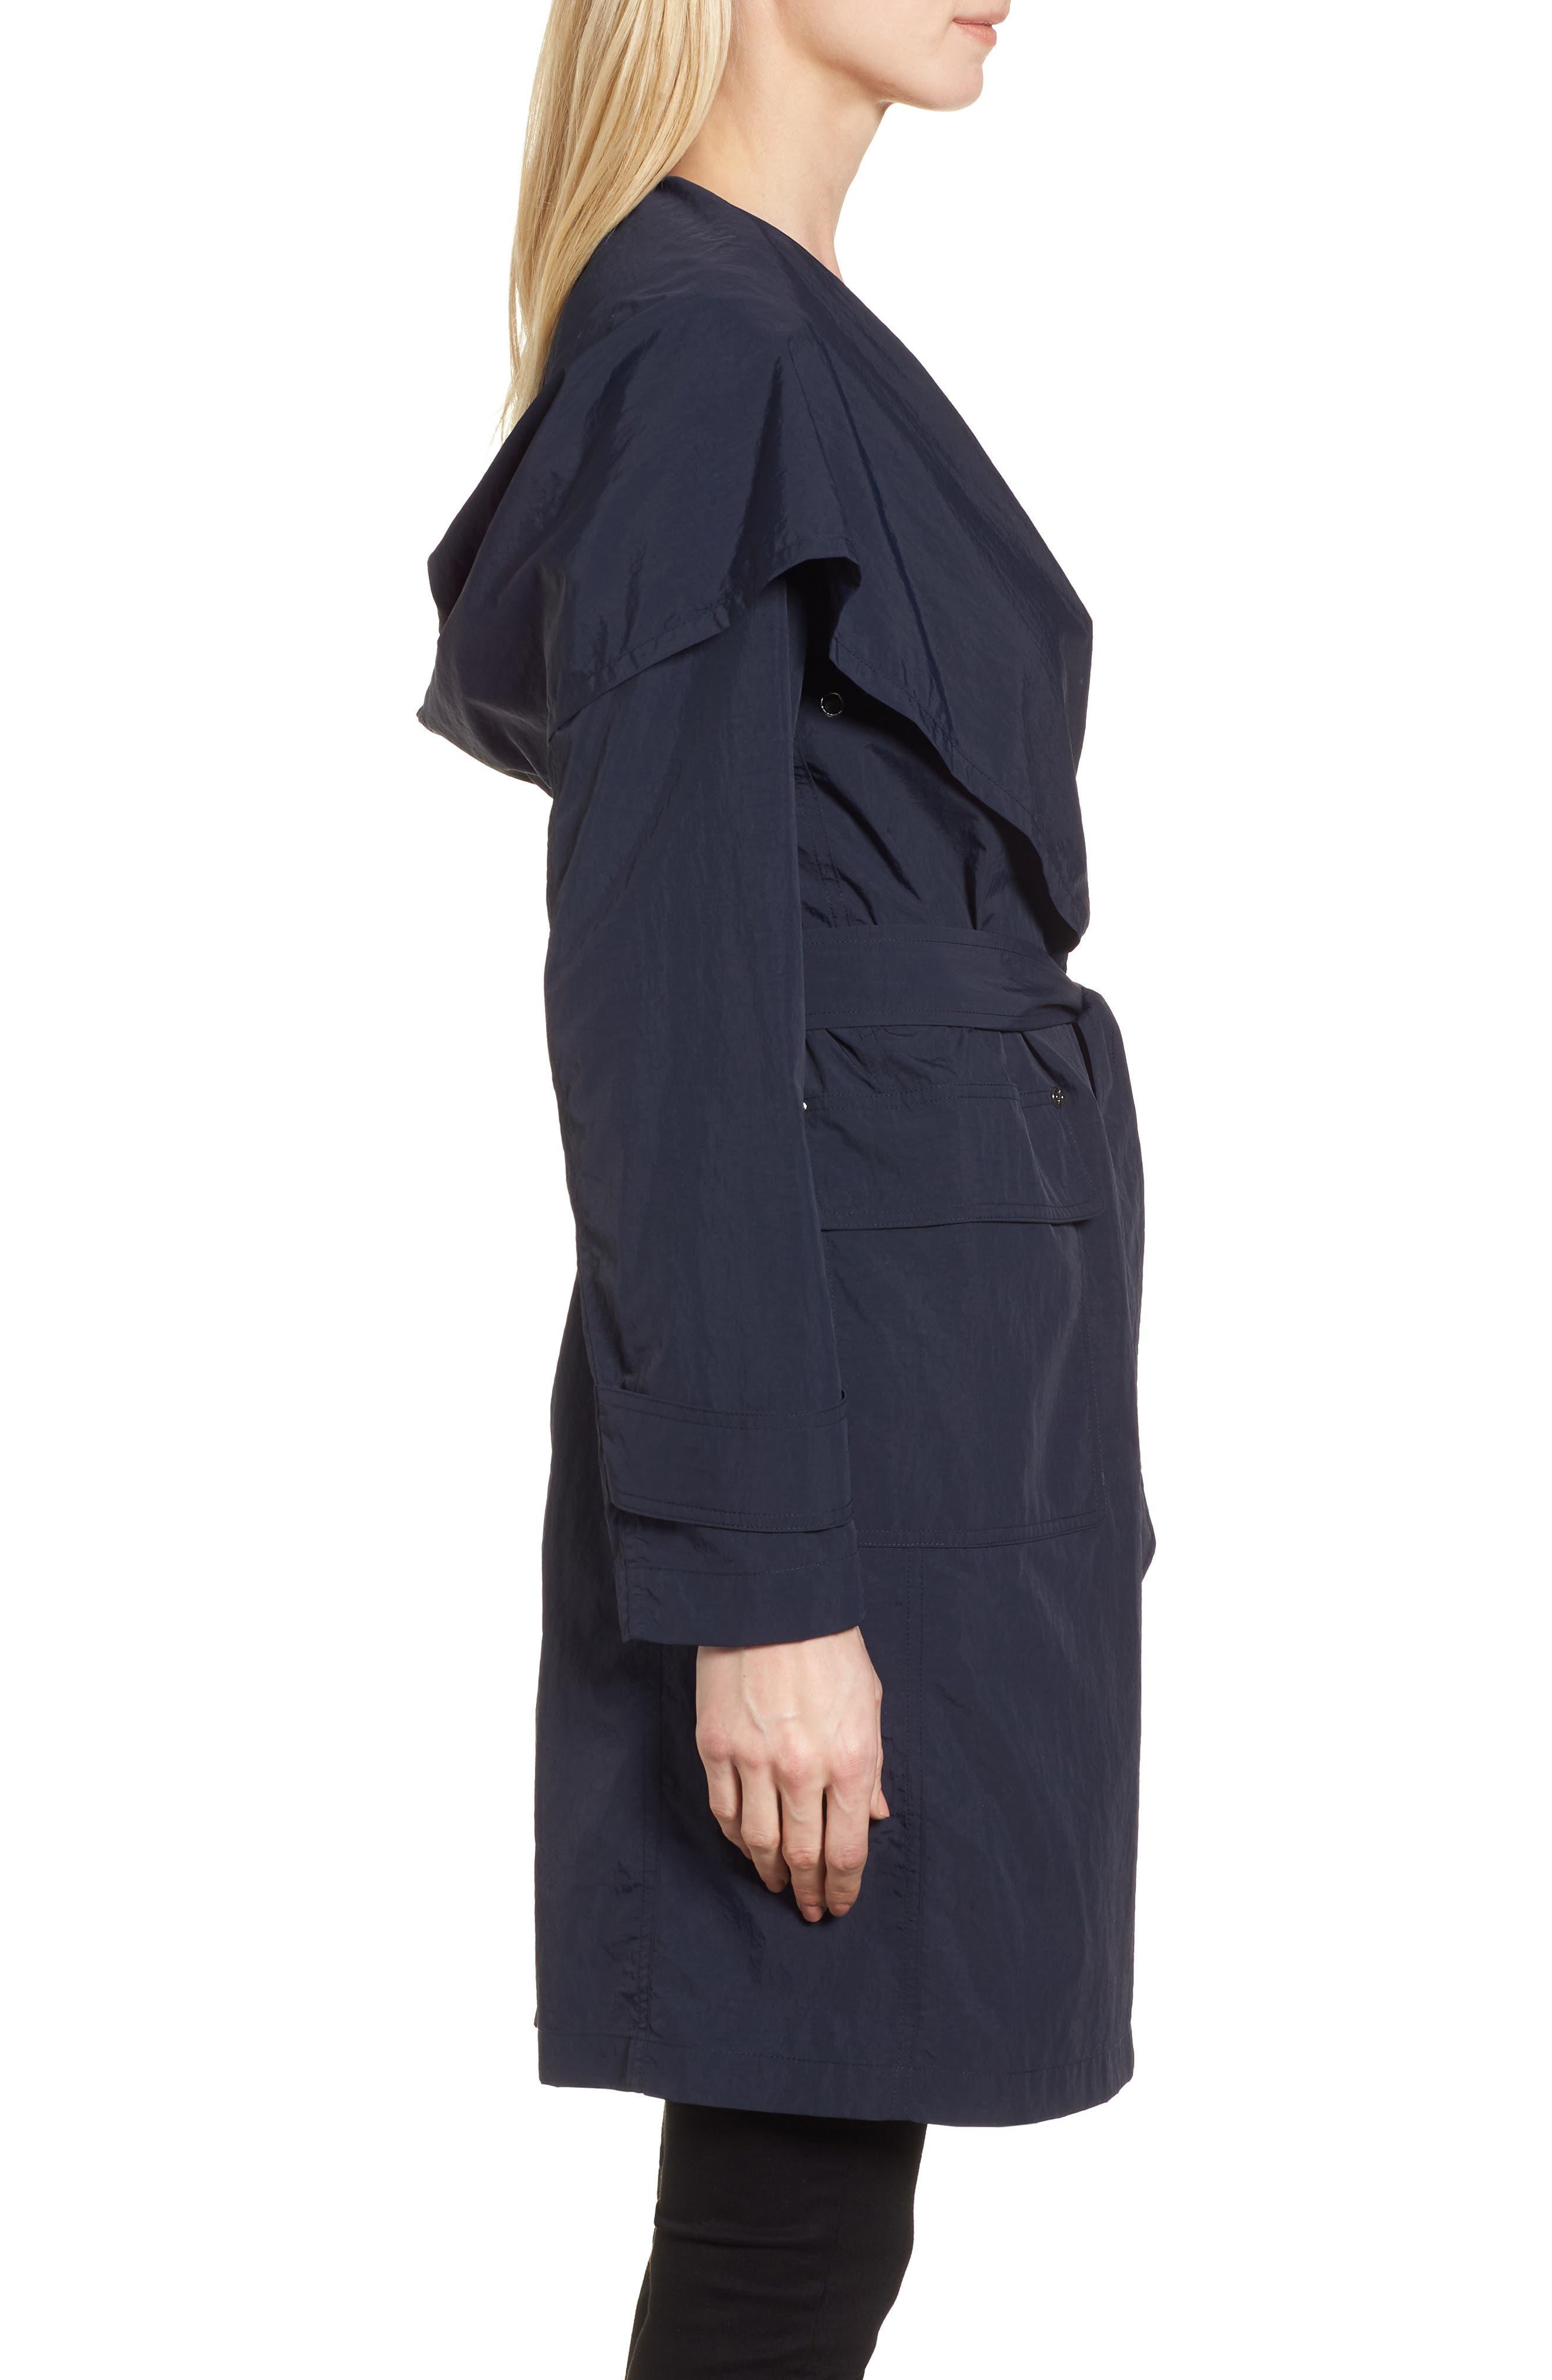 Flo Packable Hooded Raincoat,                             Alternate thumbnail 3, color,                             250